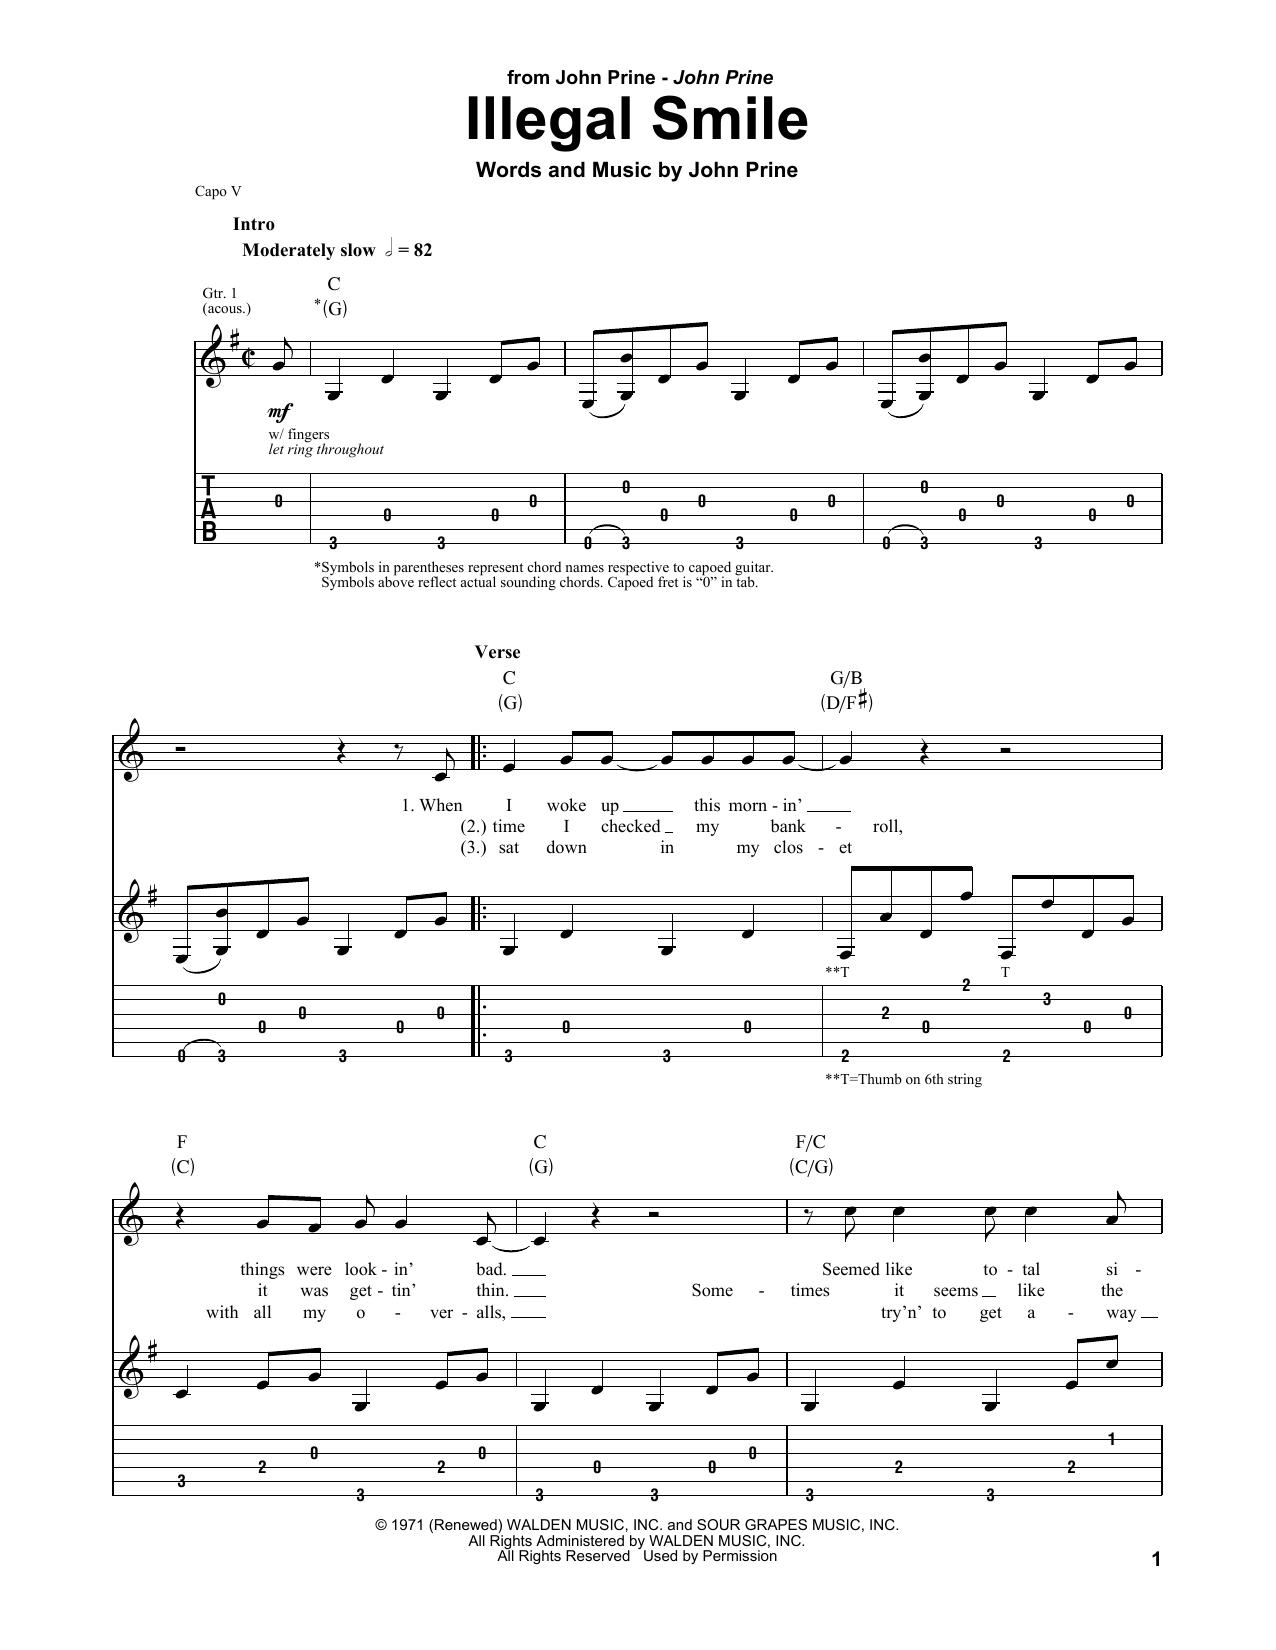 John Prine Illegal Smile sheet music notes and chords